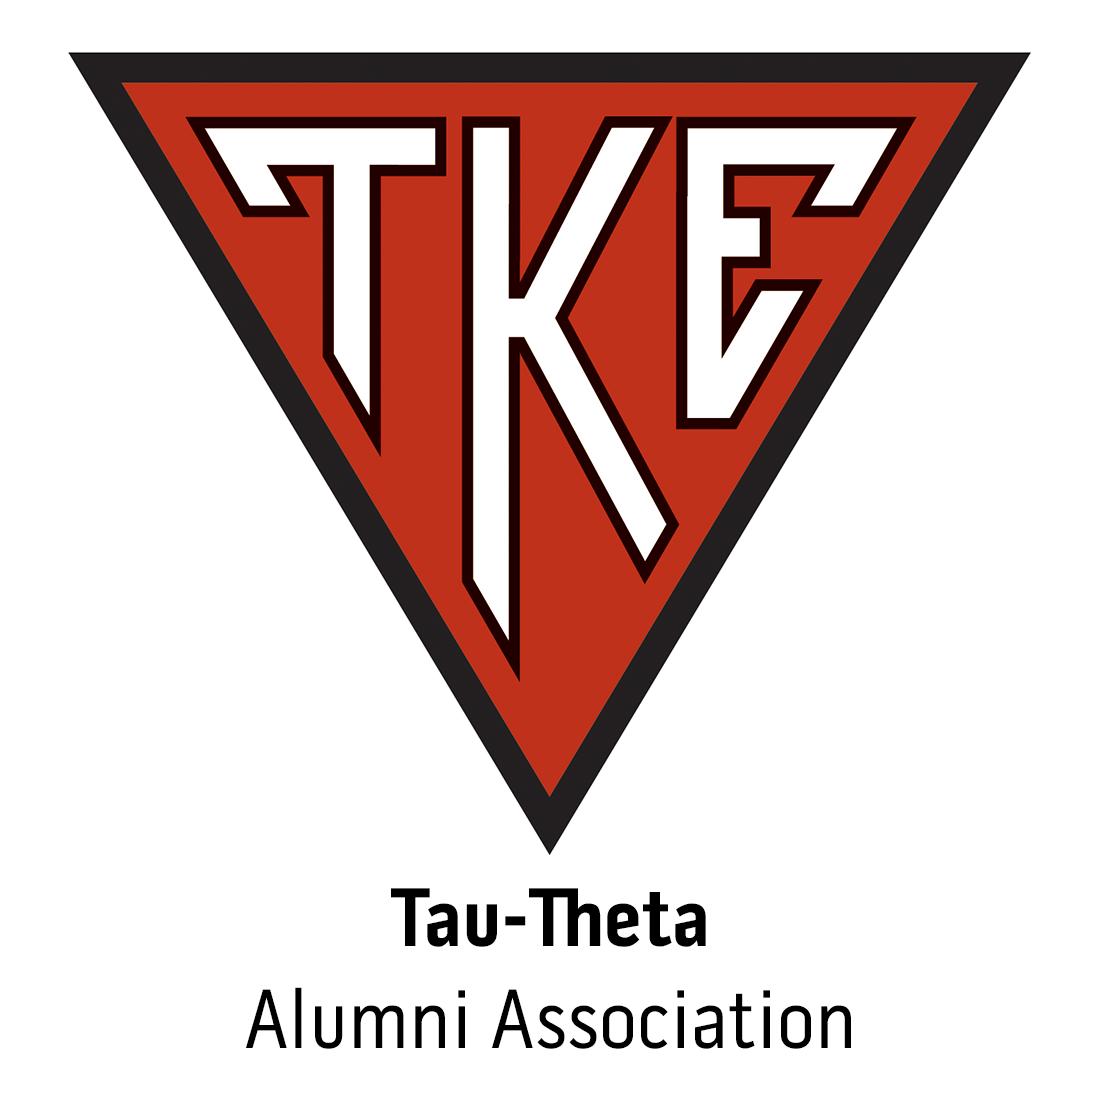 Tau-Theta Alumni Association at Fairleigh Dickinson University, Madison